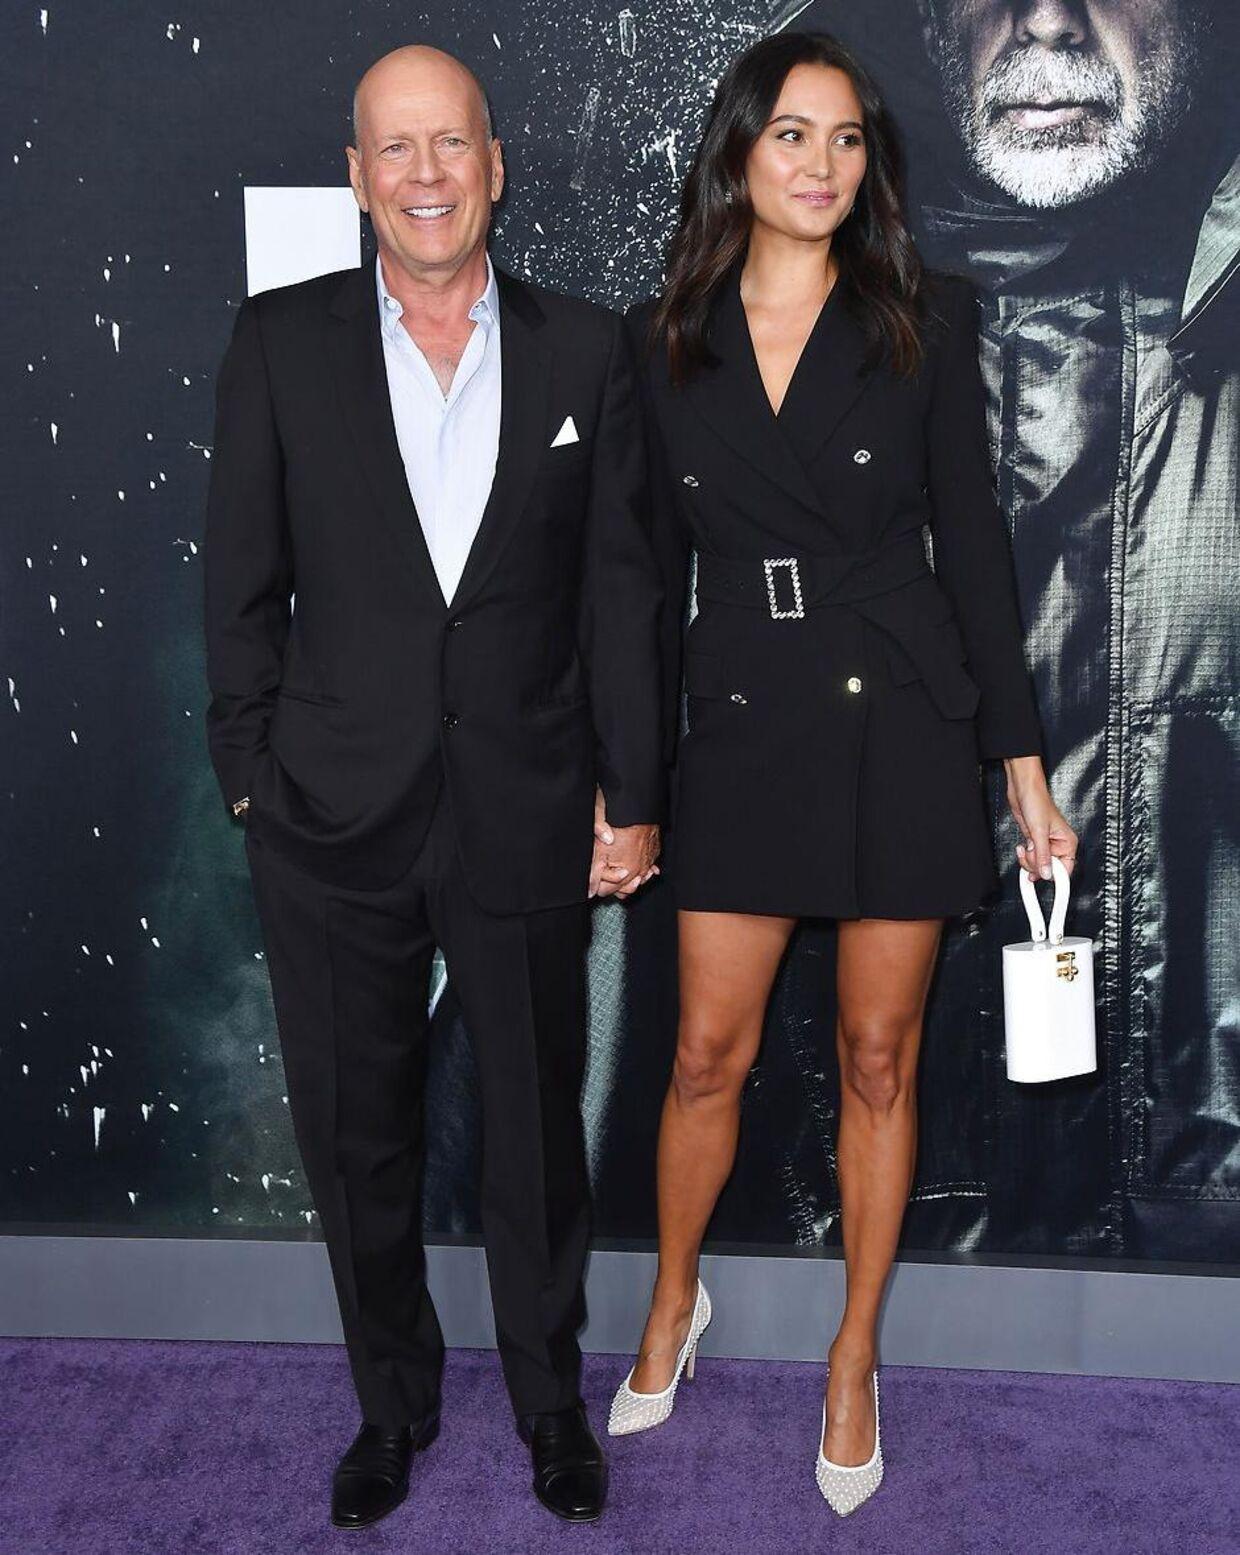 Bruce Willis med sin hustru, den engelske model Emma Heming.